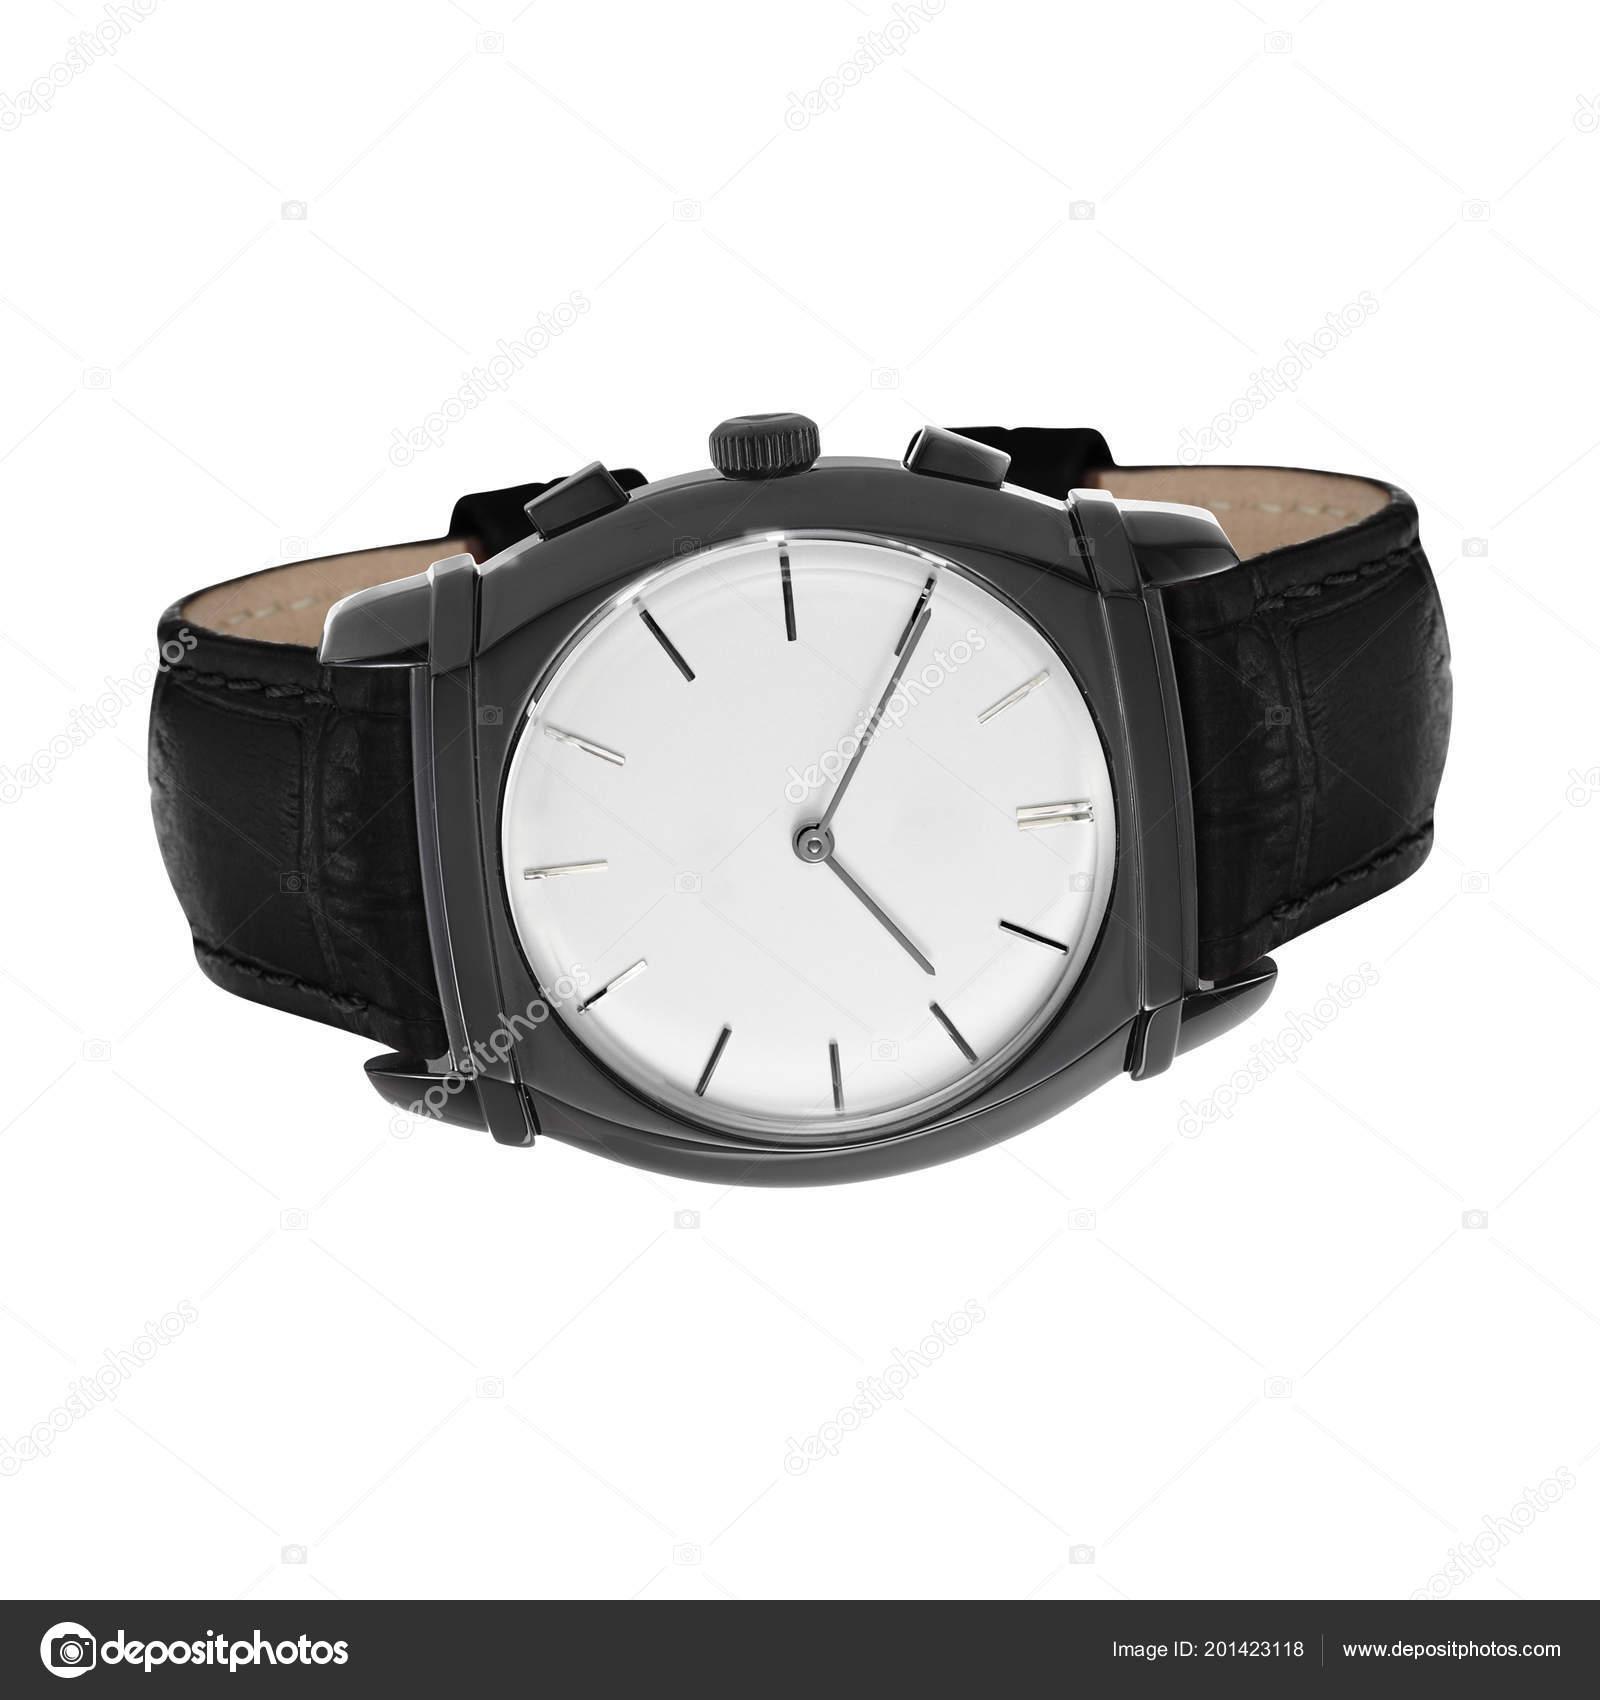 a314b5b82ca5 Reloj Pulsera Hombres Aislado Blanco — Fotos de Stock © ozaiachinn ...